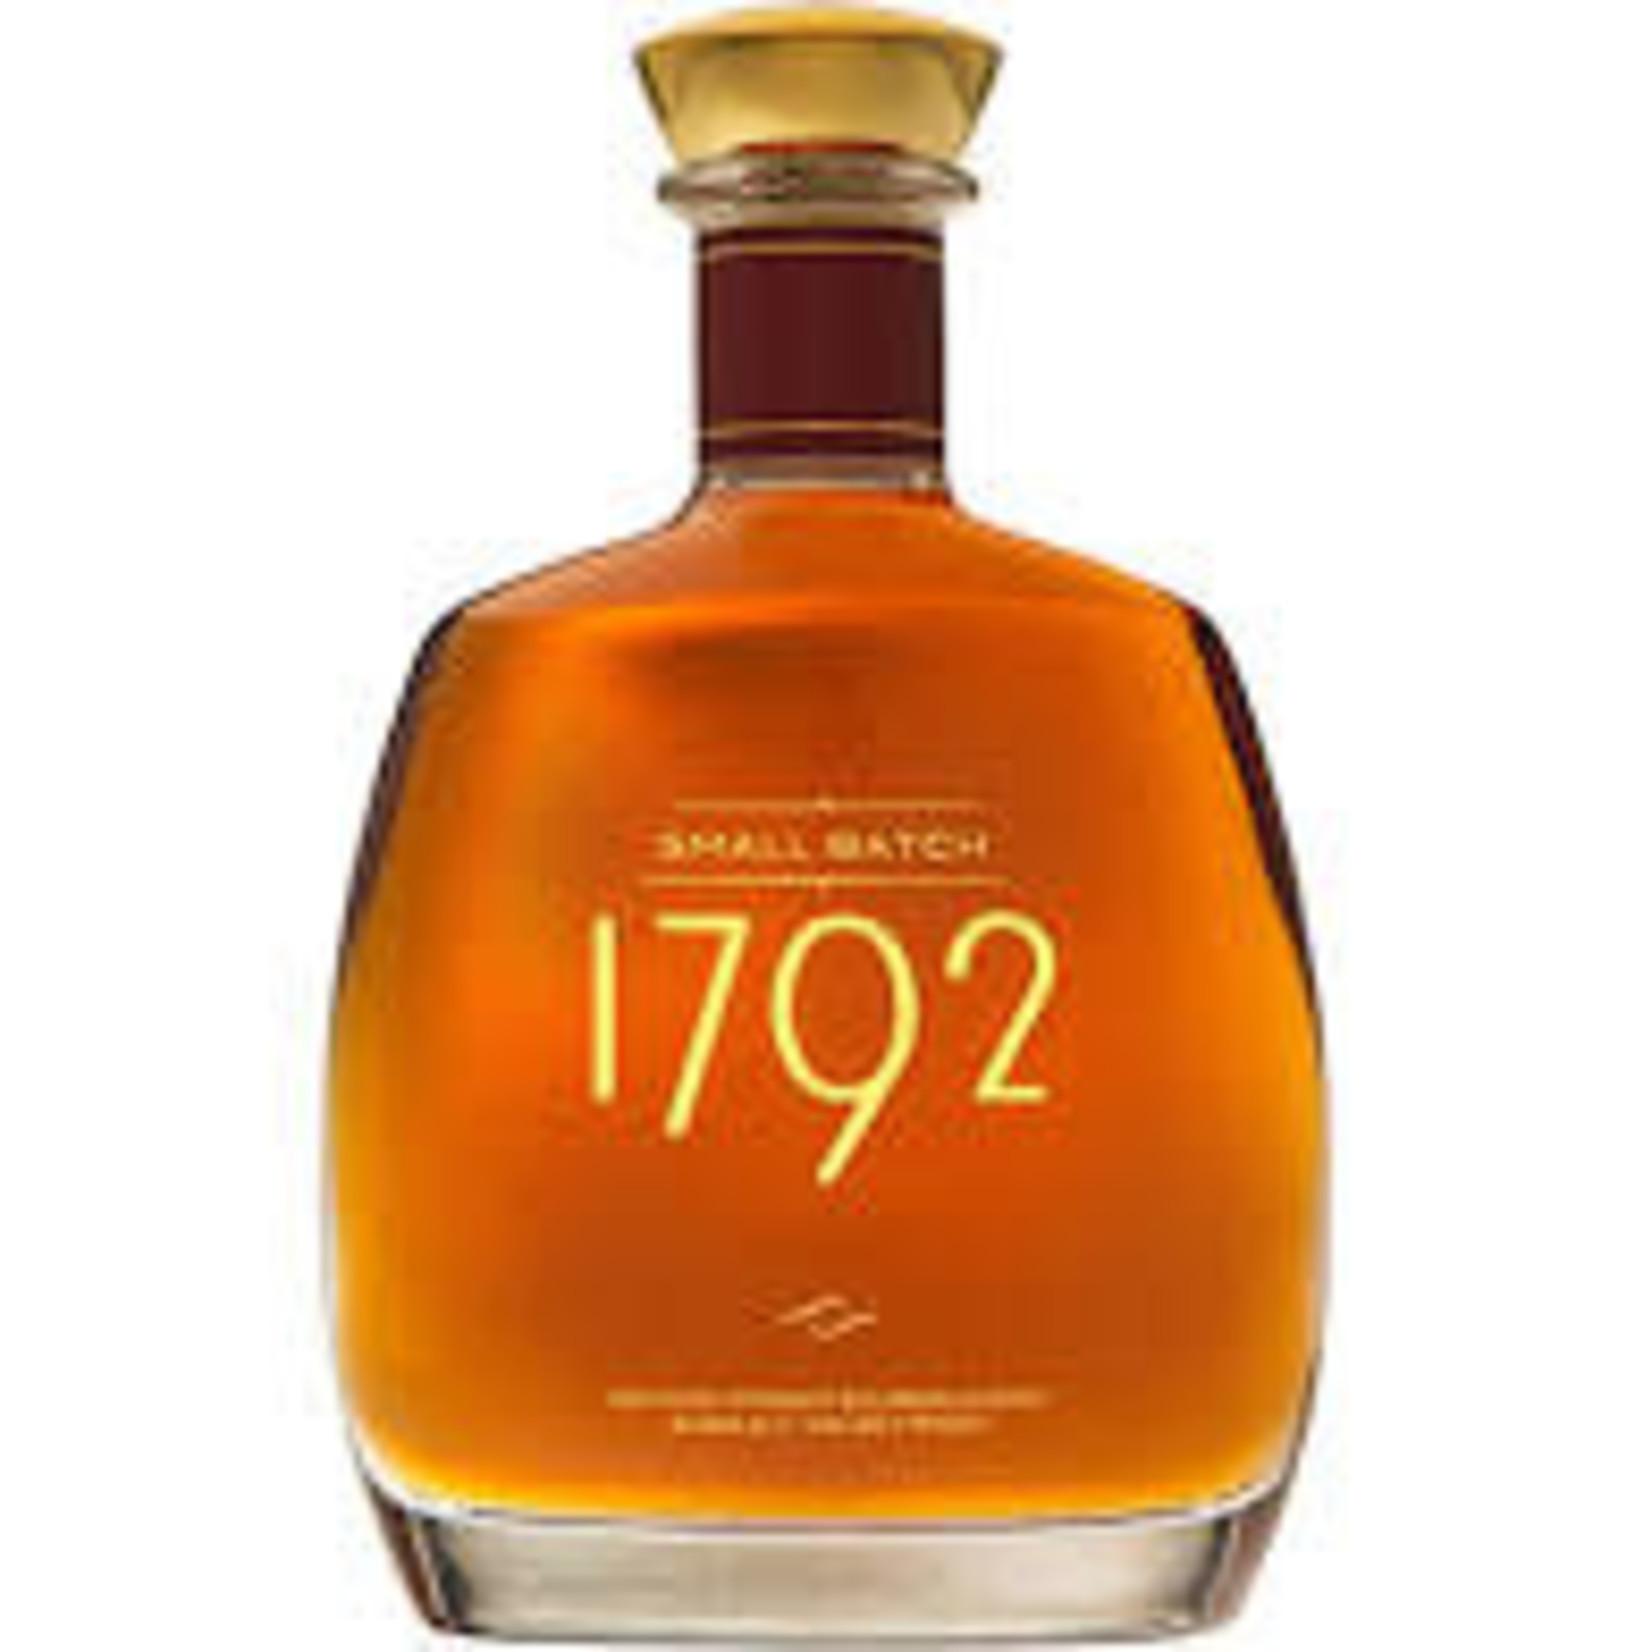 Spirits Ridgemont Small Batch Bourbon 1792